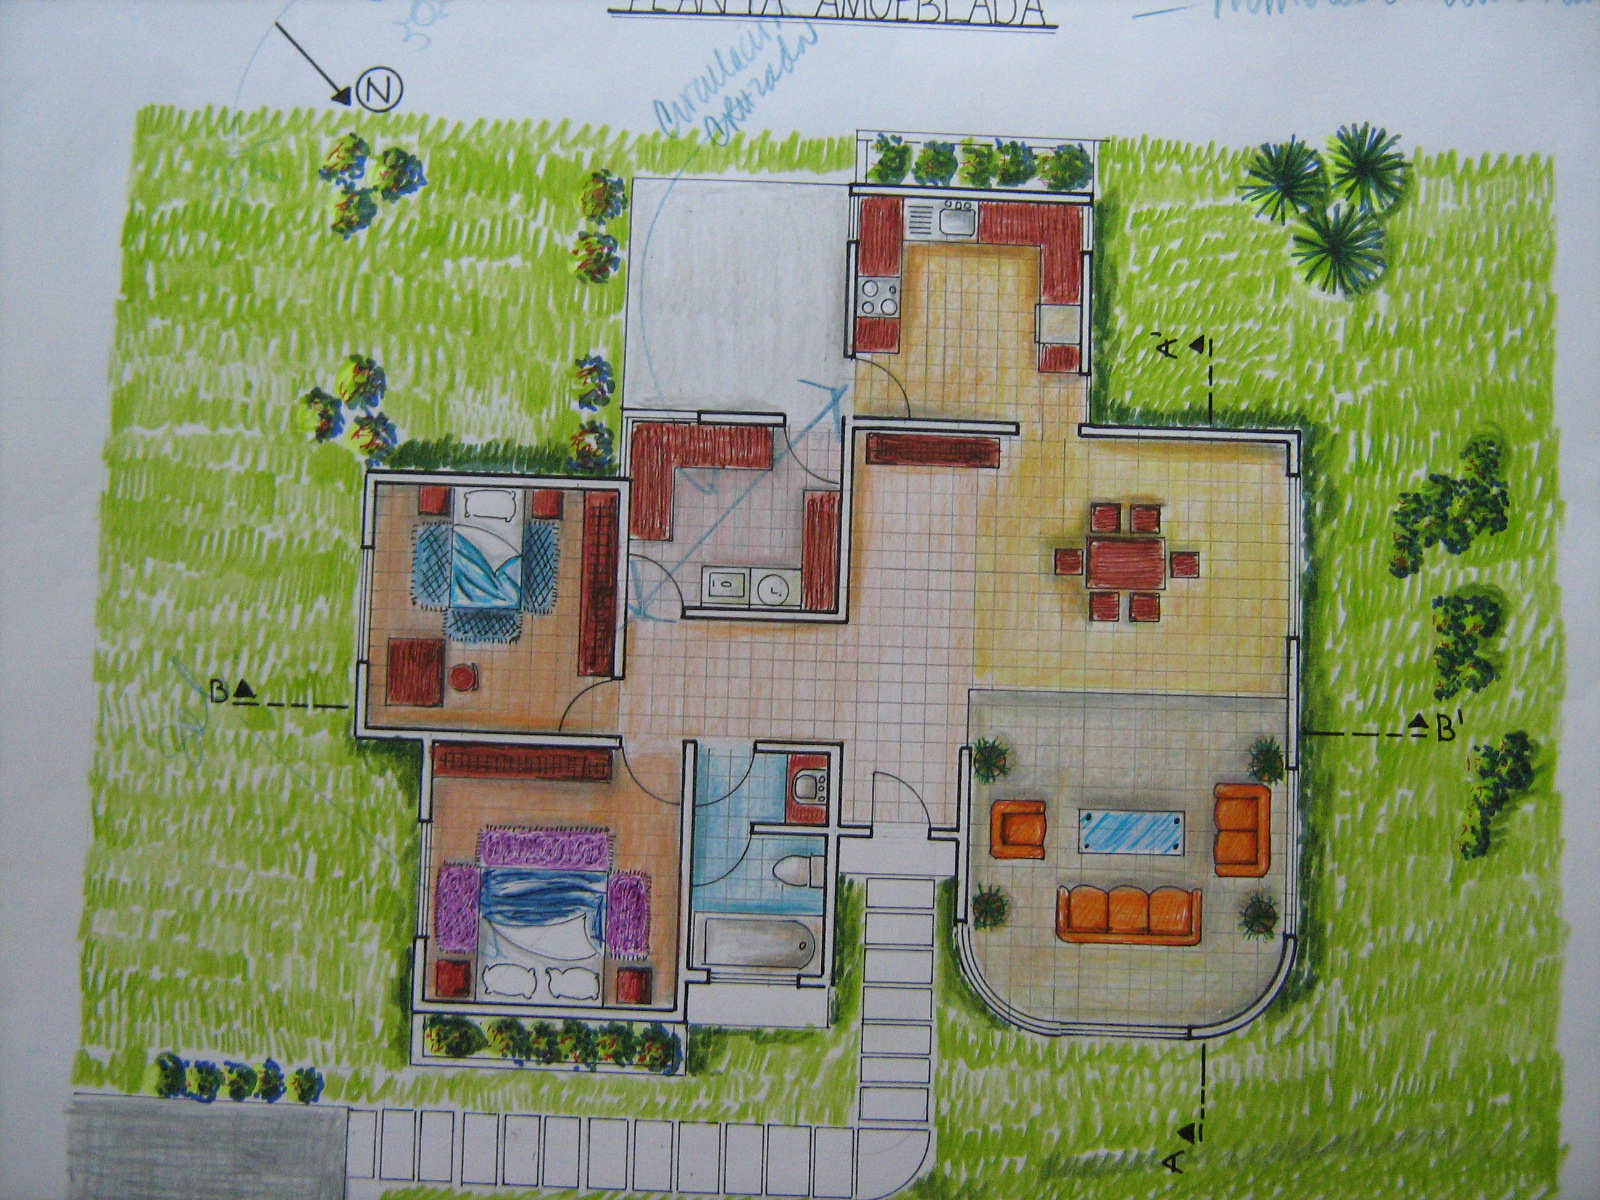 Mi portafolio de arquitectura usac 03 16 13 for Plantas de arquitectura